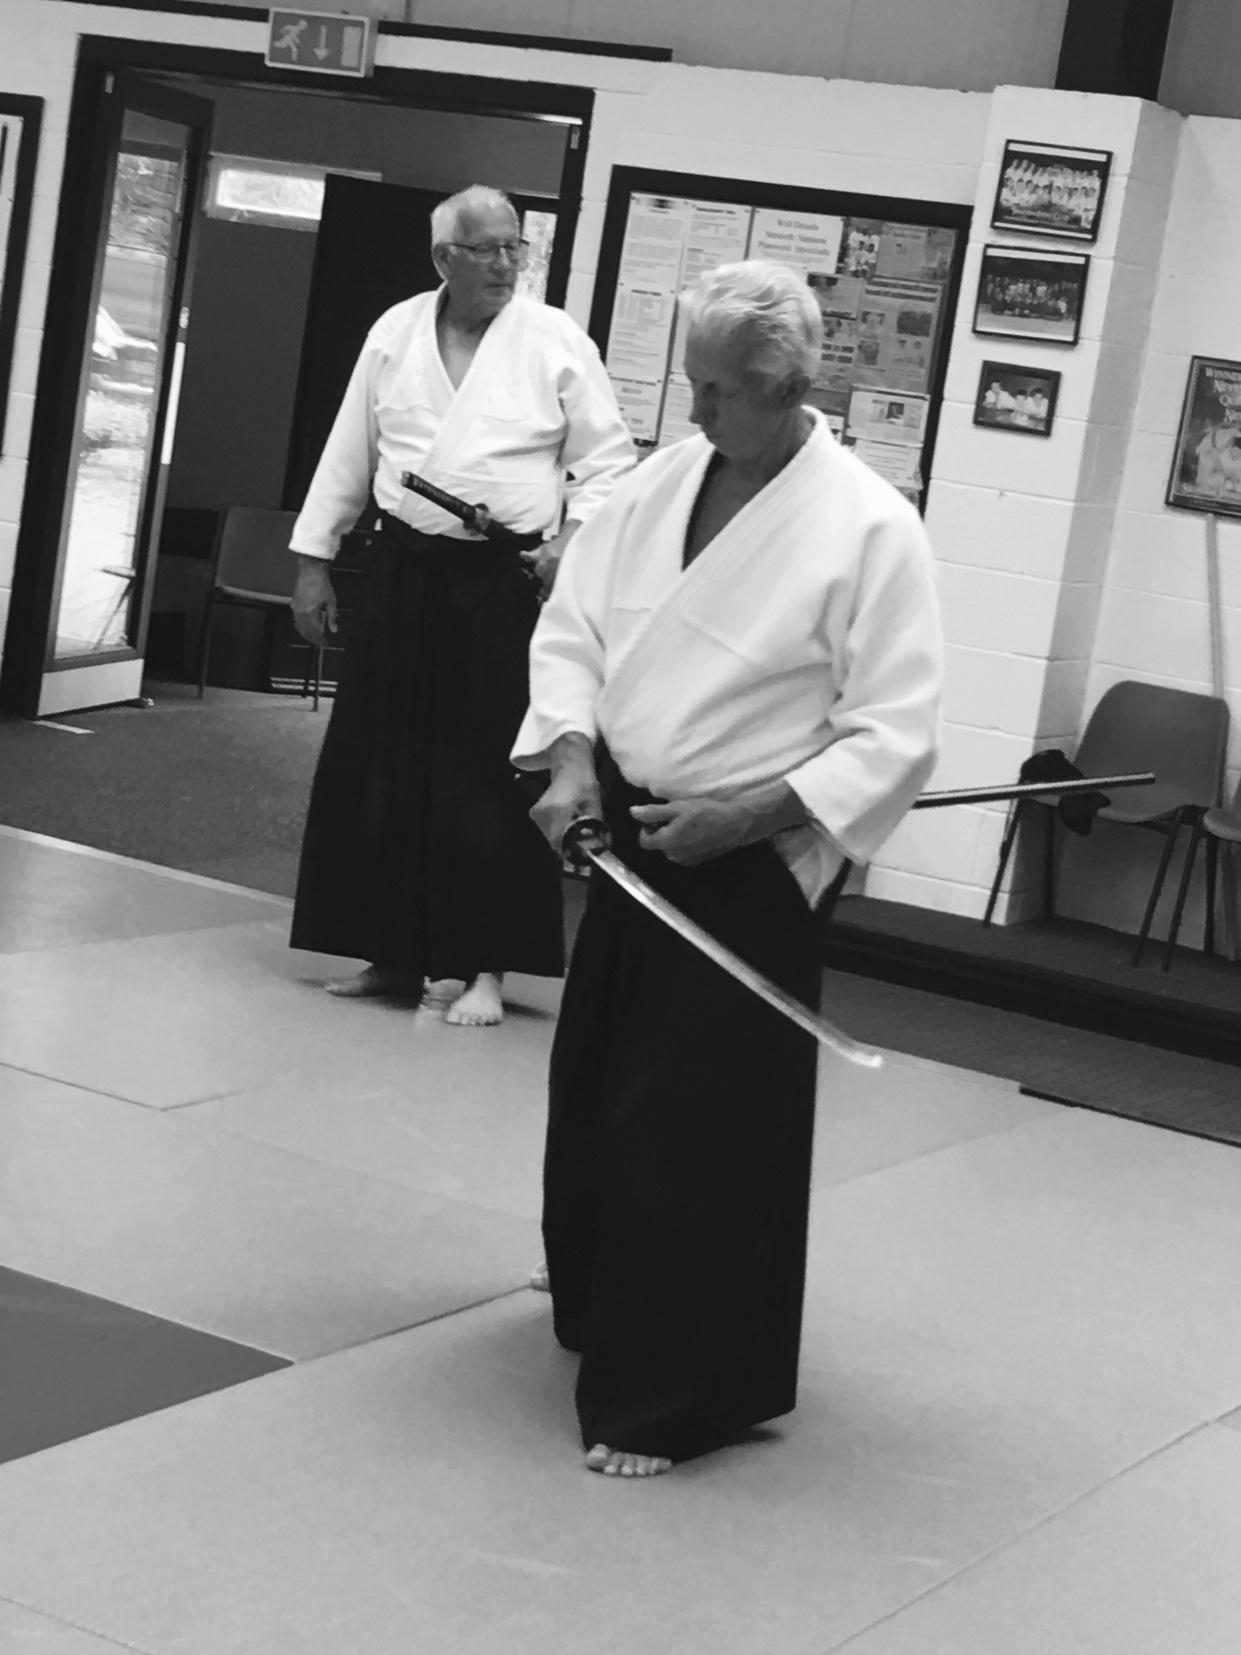 Sensei Paul with a Live blade